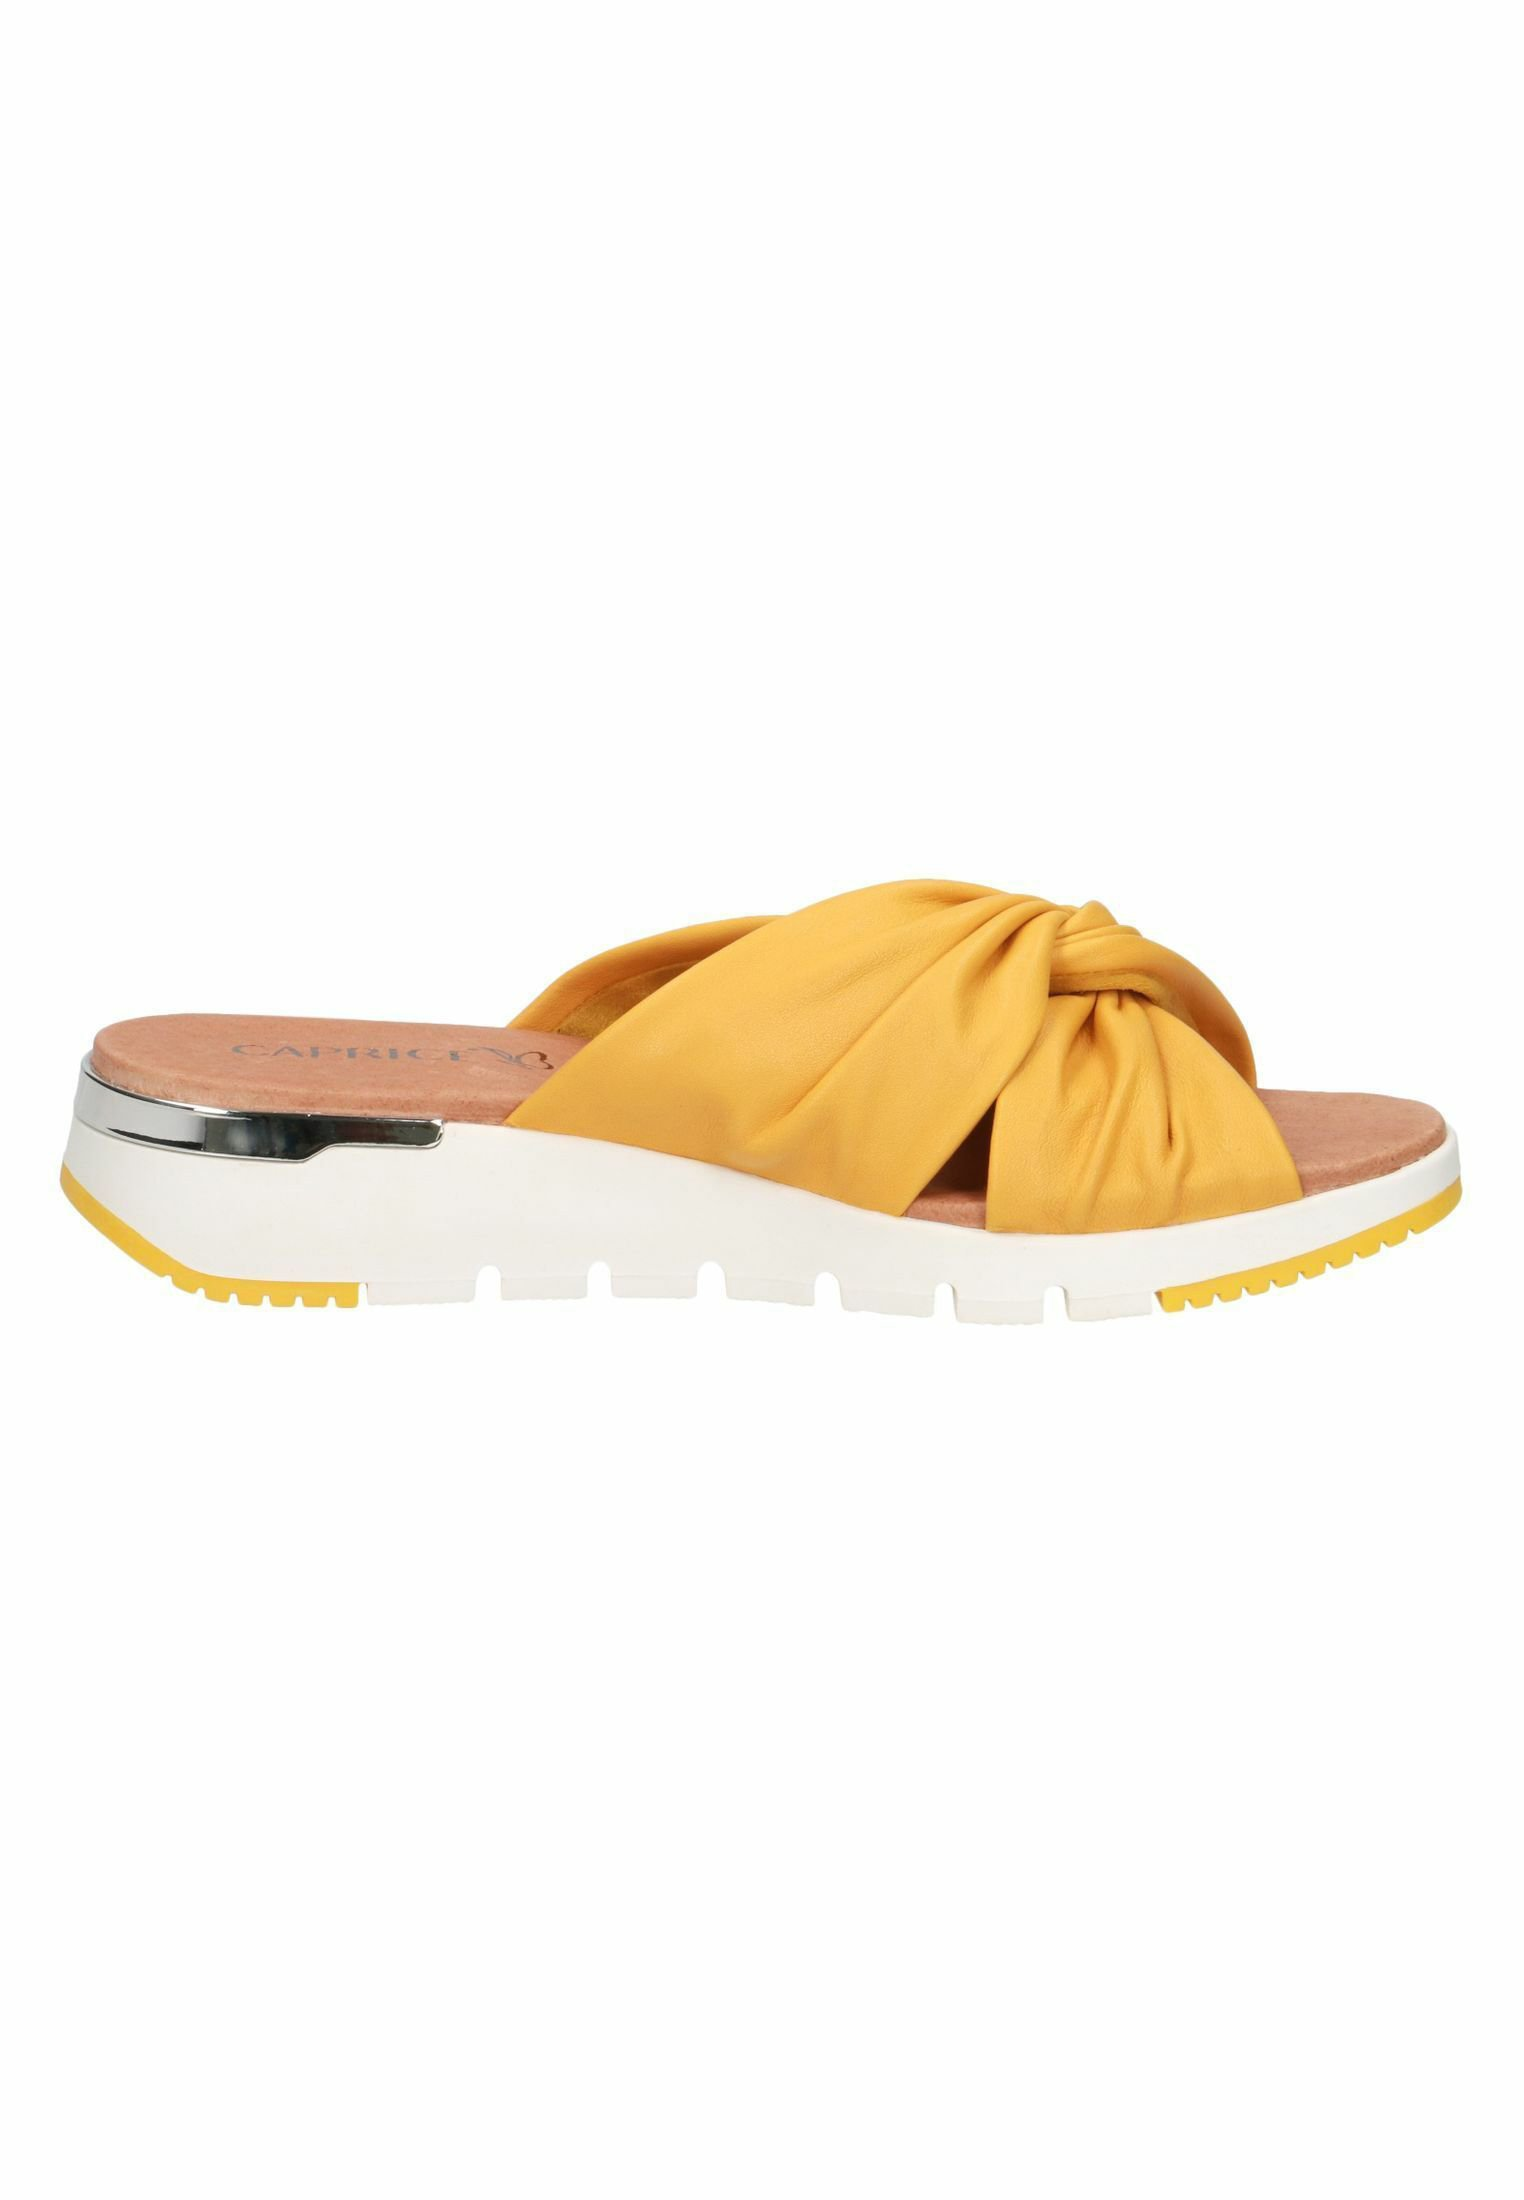 Caprice Pantolette flach sunflower soft/gelb